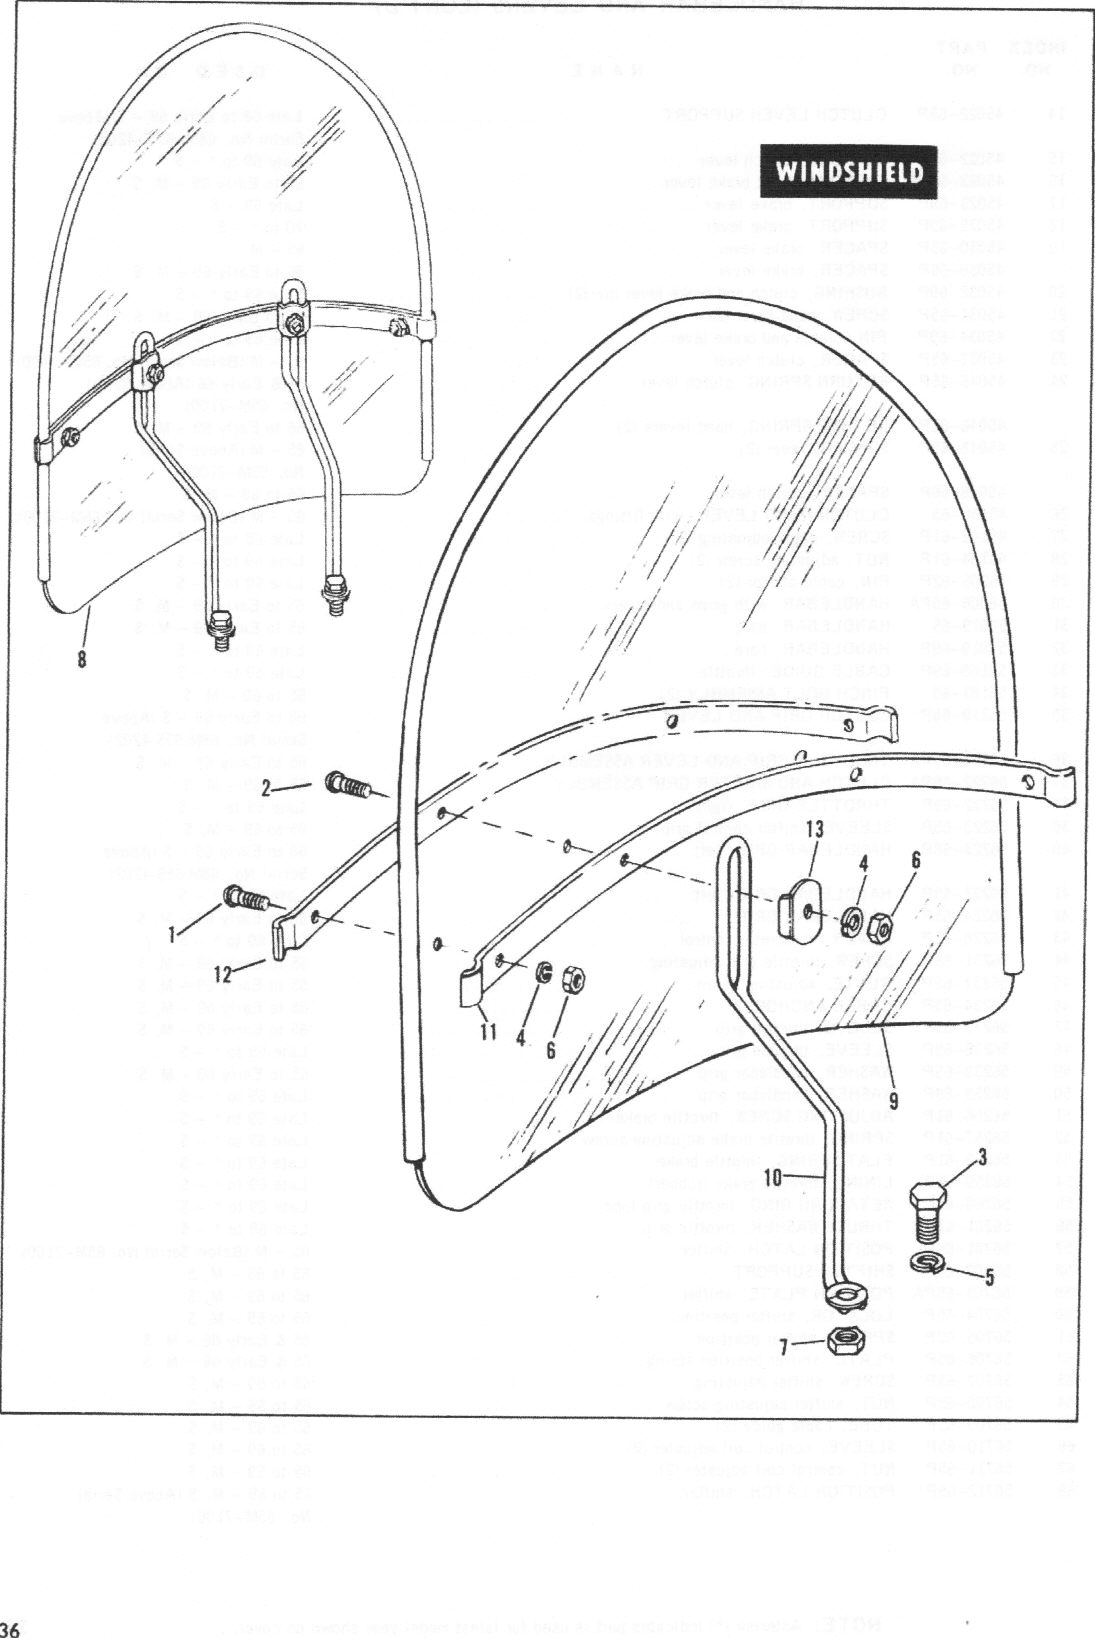 Harley Davidson Oem Parts Diagram Aermacchi M50 • Wiring